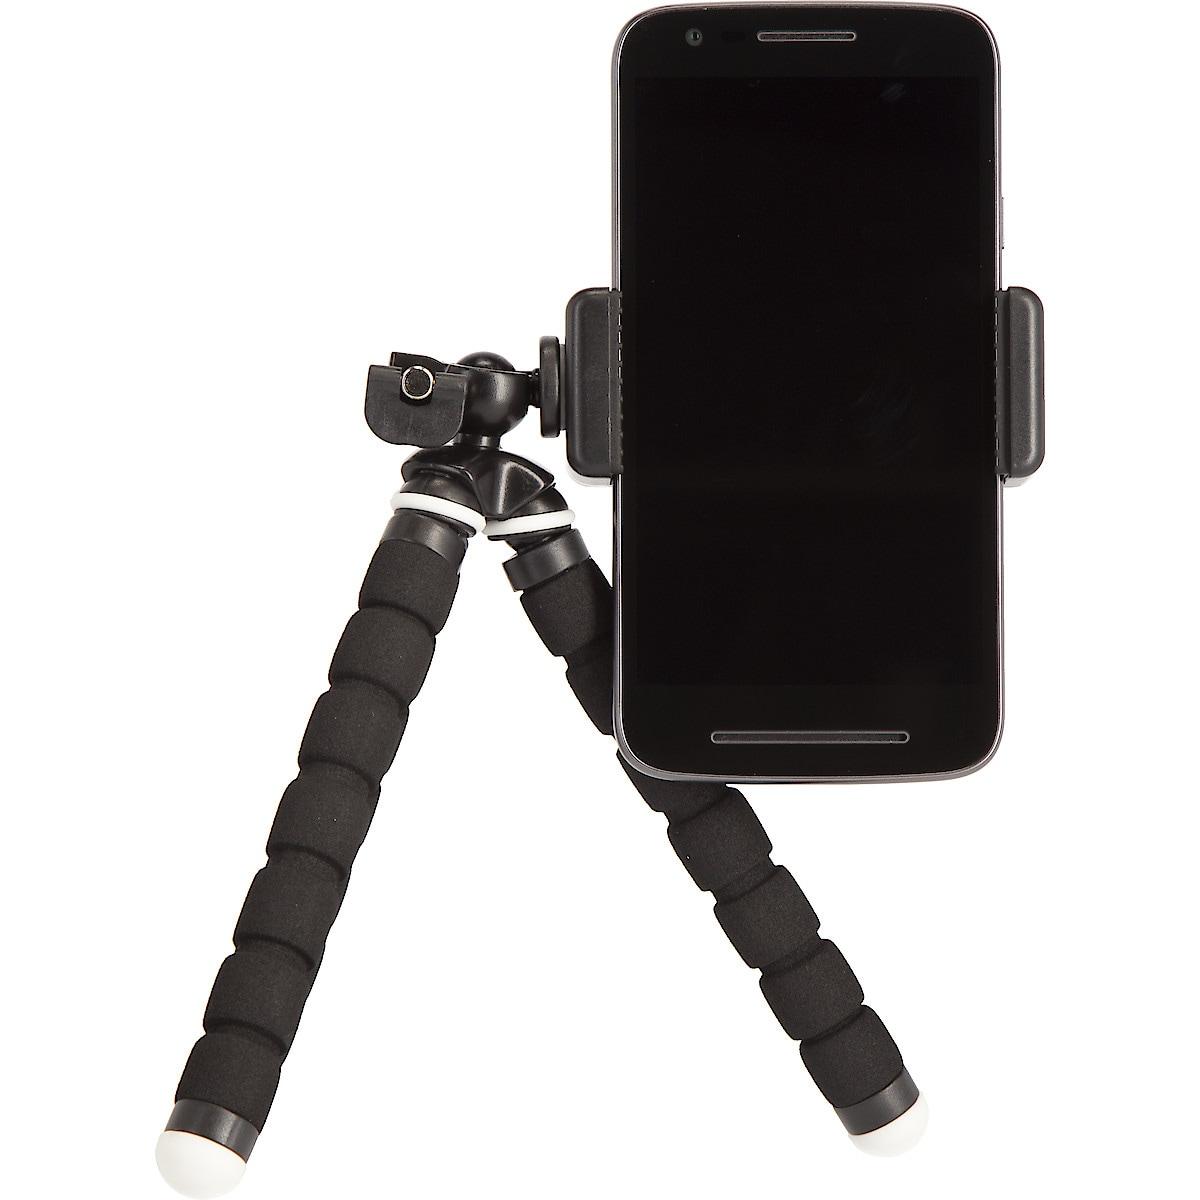 Stativ med holder for mobiltelefon